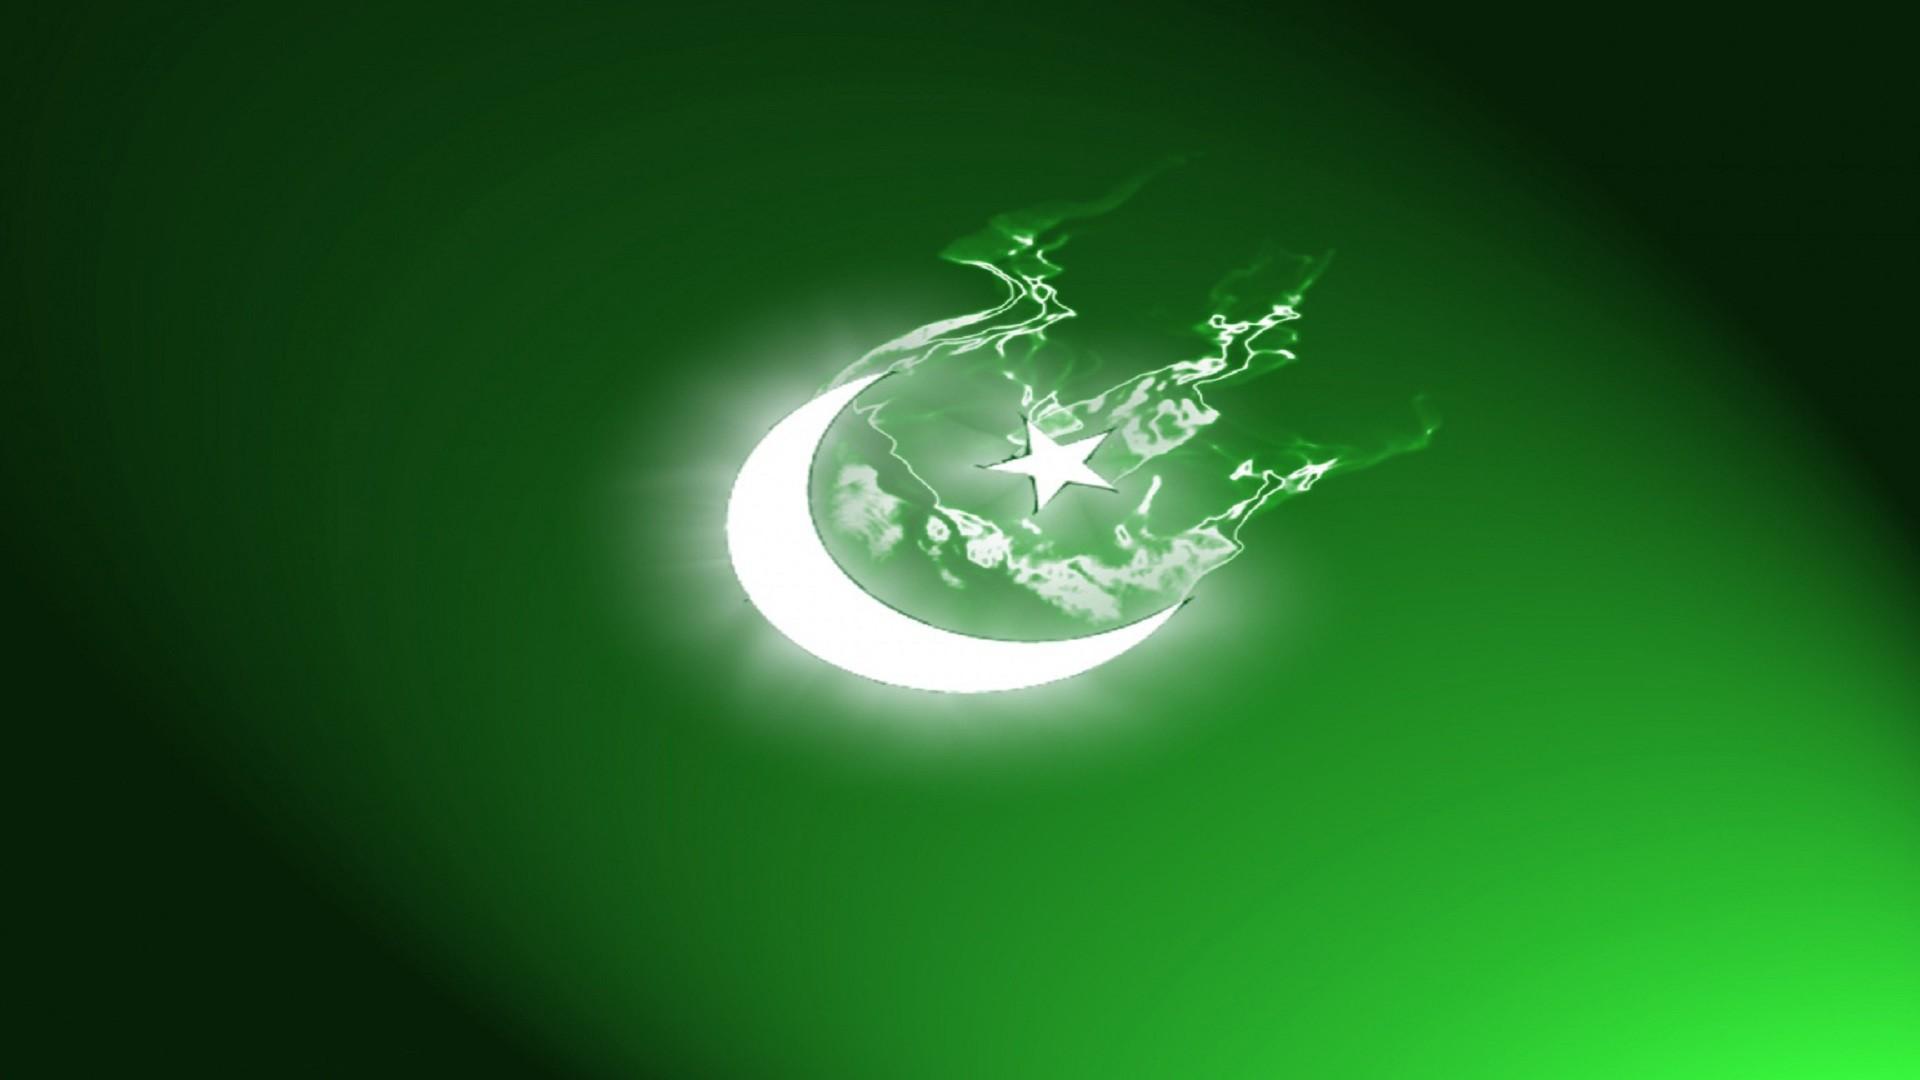 3d pakistan flag wallpaper 2018 top 10 60 images for 3d wallpaper for home in karachi